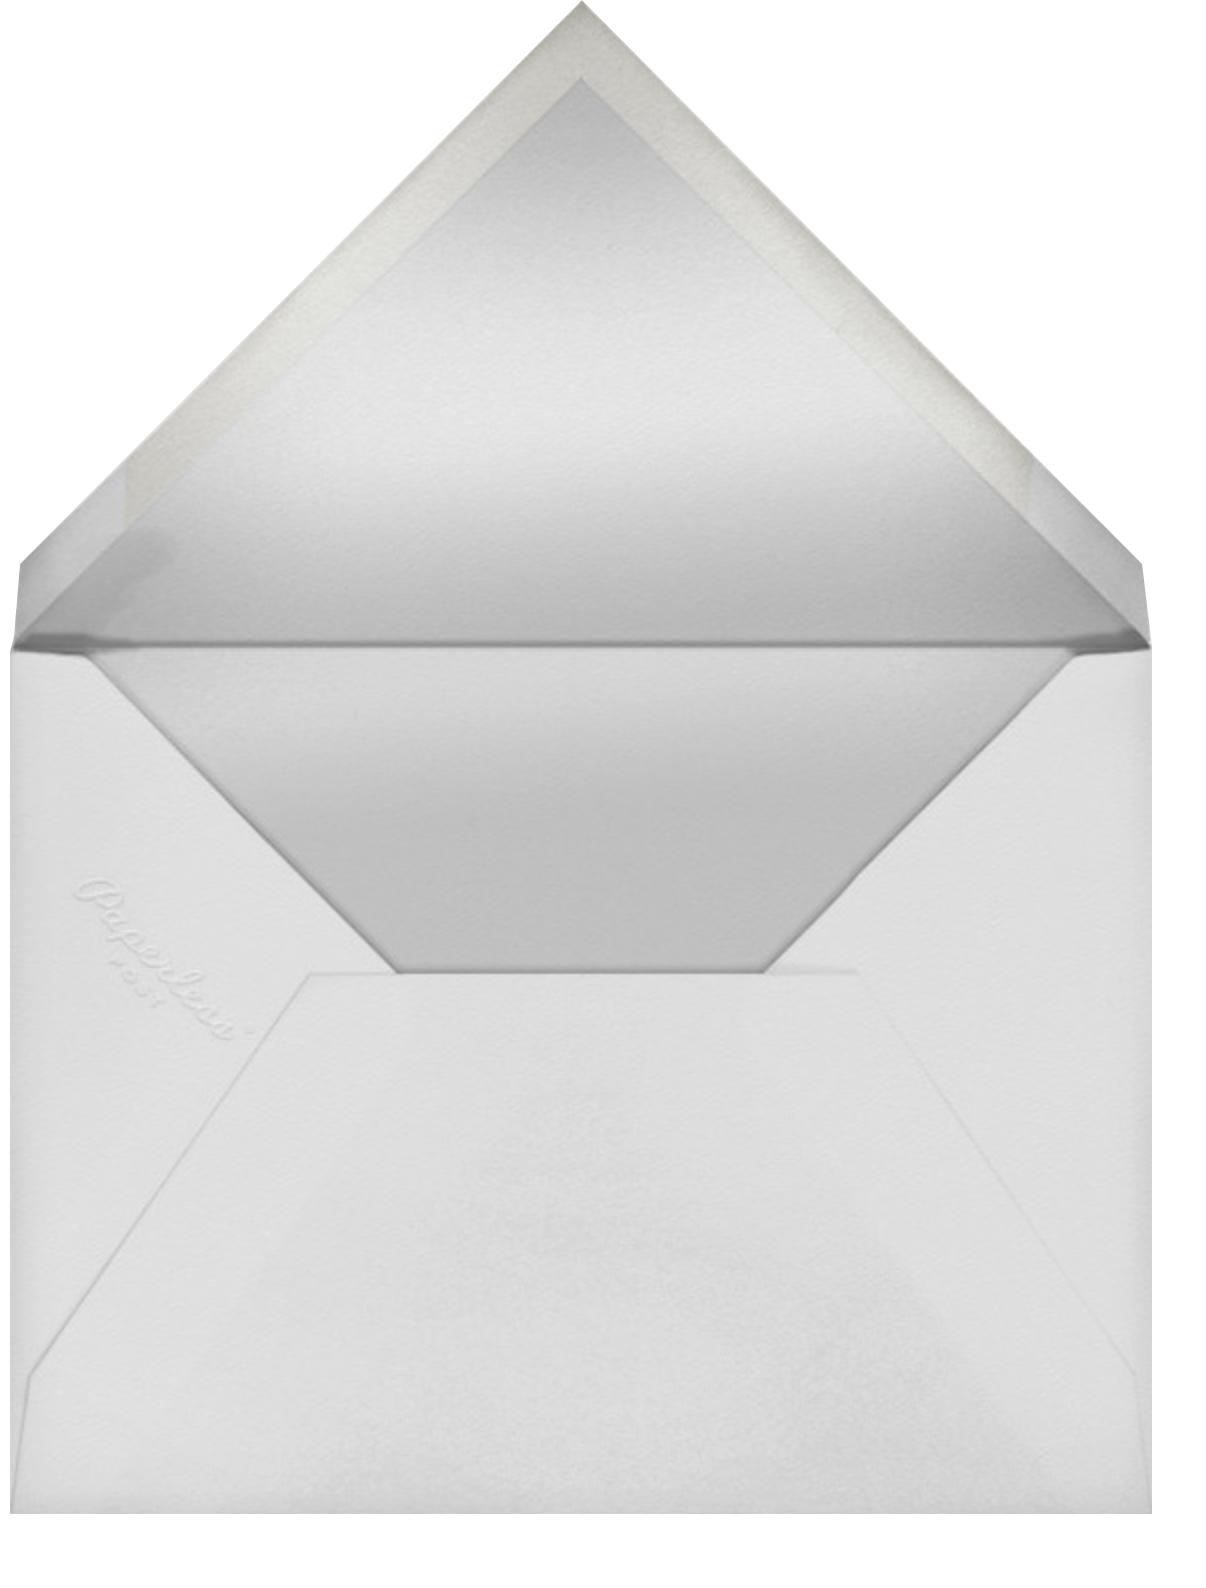 Electric Love - Paperless Post - Envelope